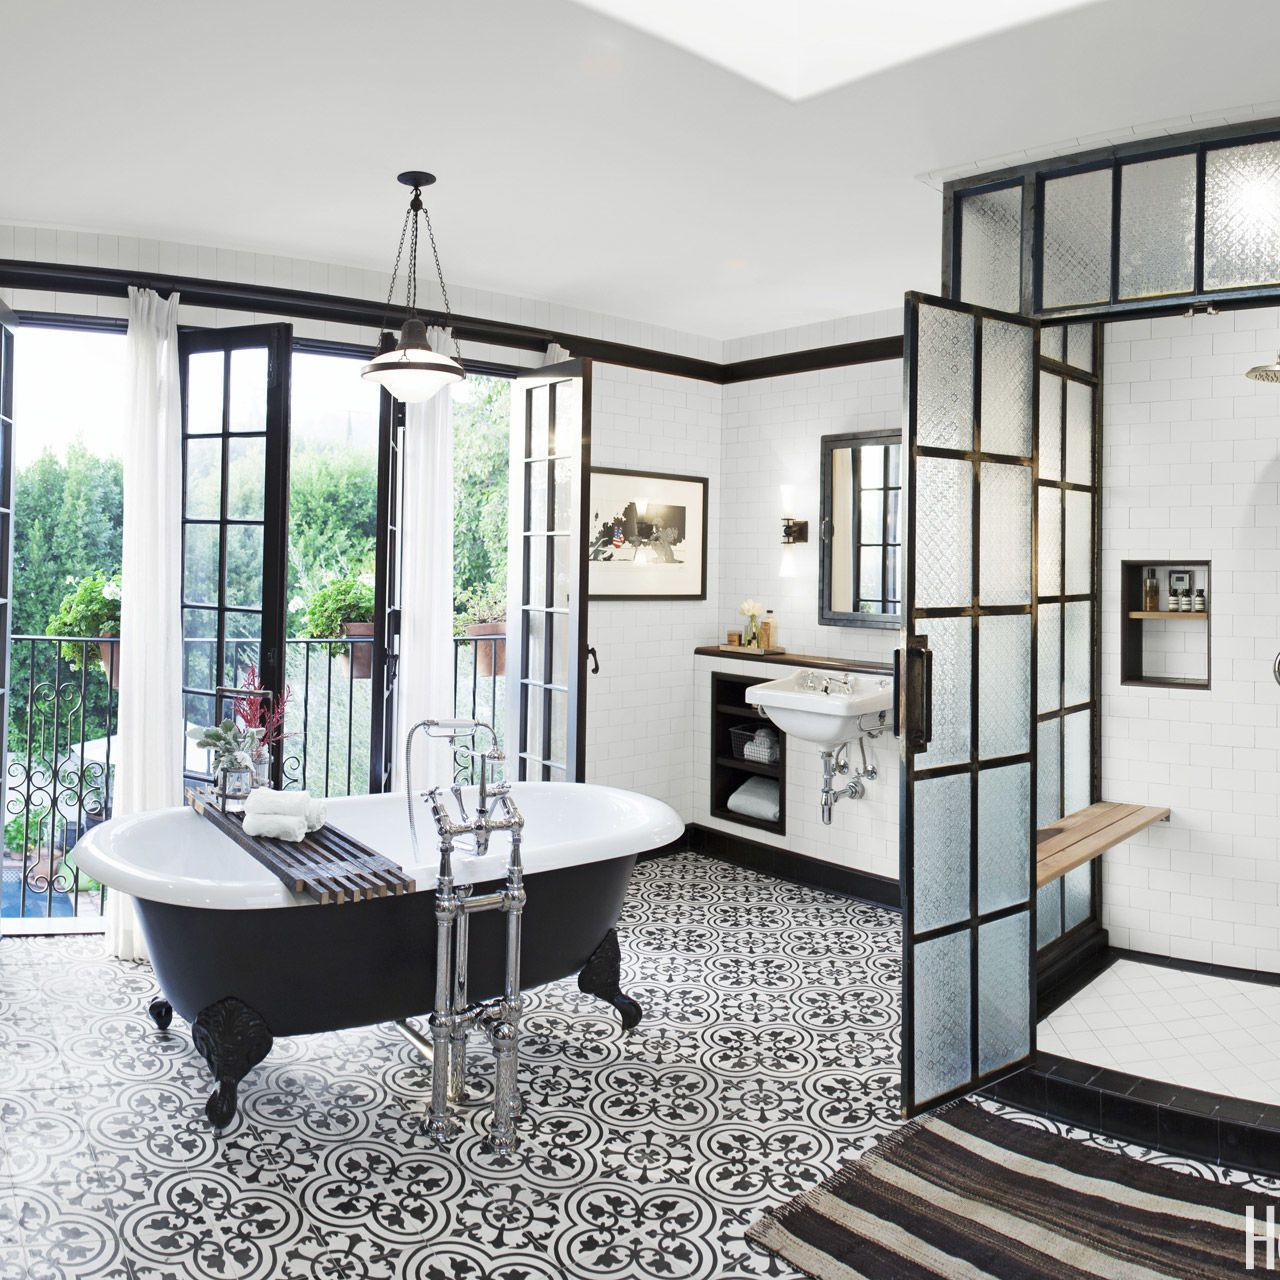 House interior designs pictures